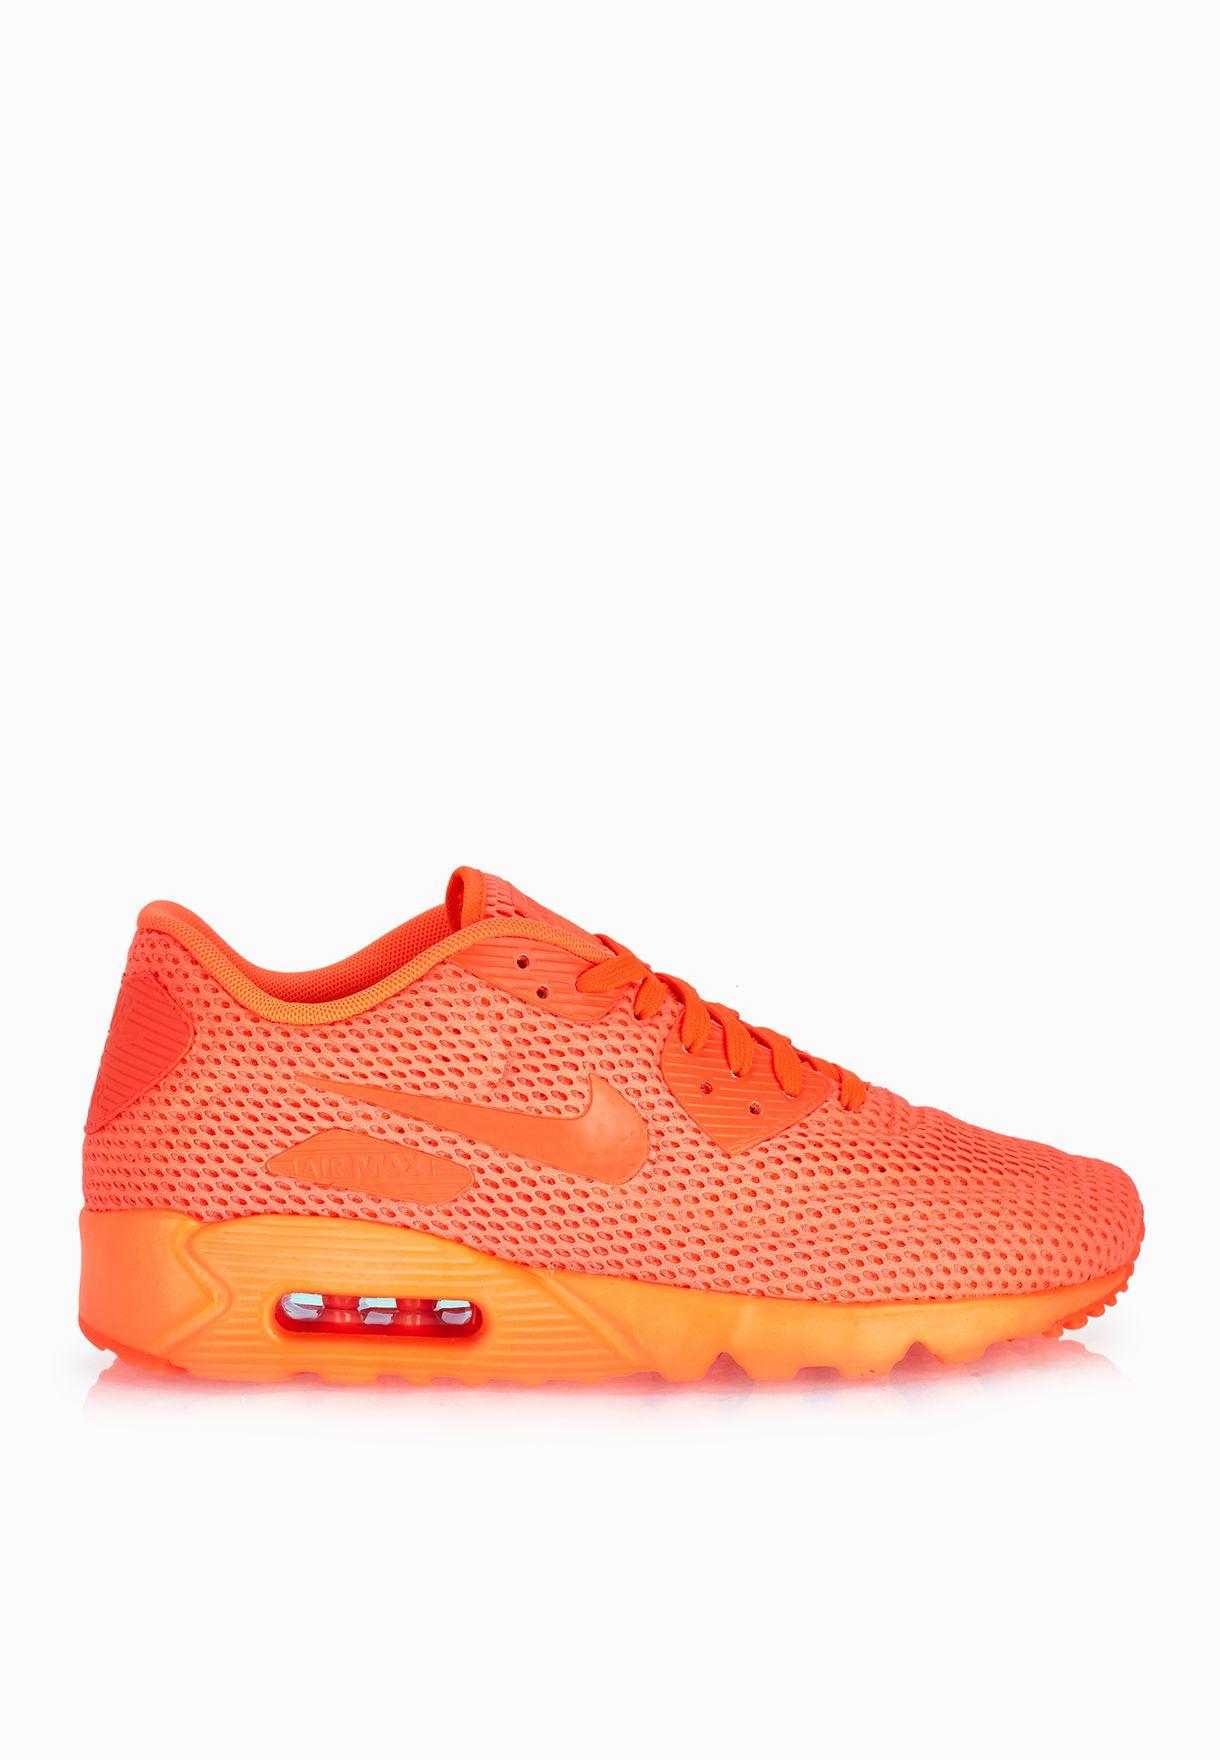 timeless design e1f2e d493f Shop Nike orange Air Max 90 Ultra BR 725222-800 for Men in Qatar ...